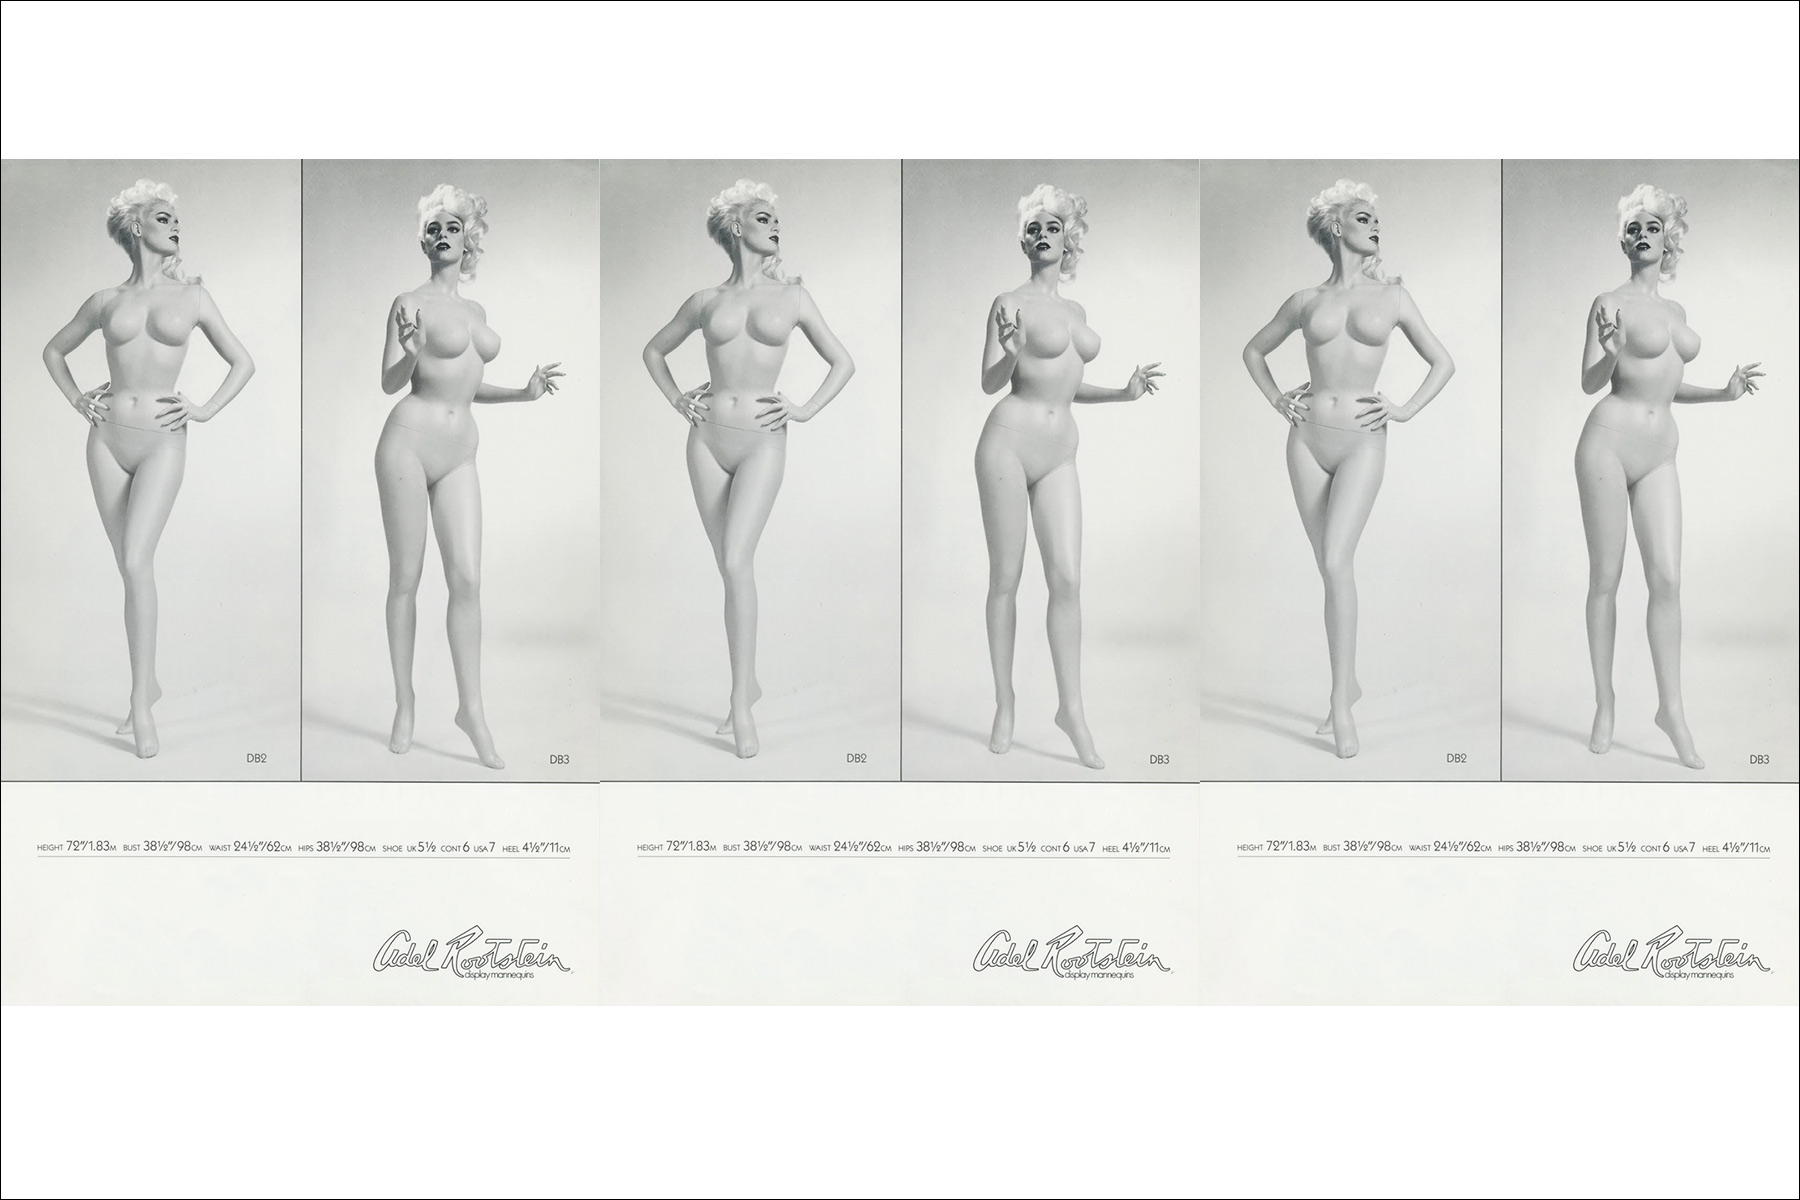 Dianne Brill for Adel Rootstein mannequinn's. Ponyboy magazine NY.